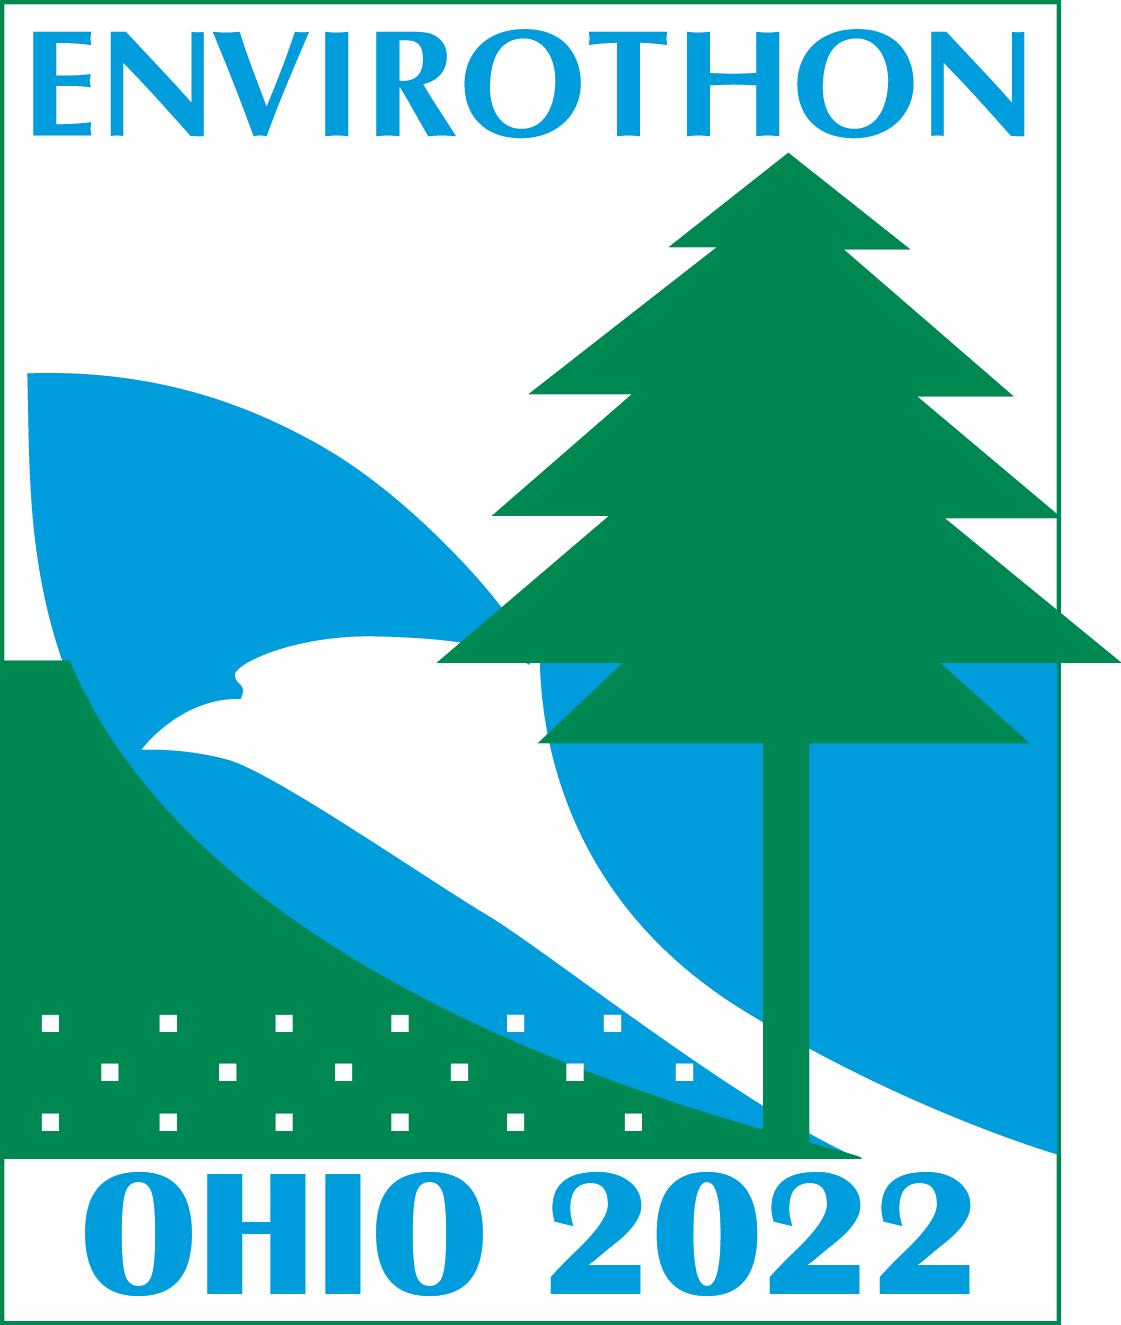 Envirothon Ohio2022